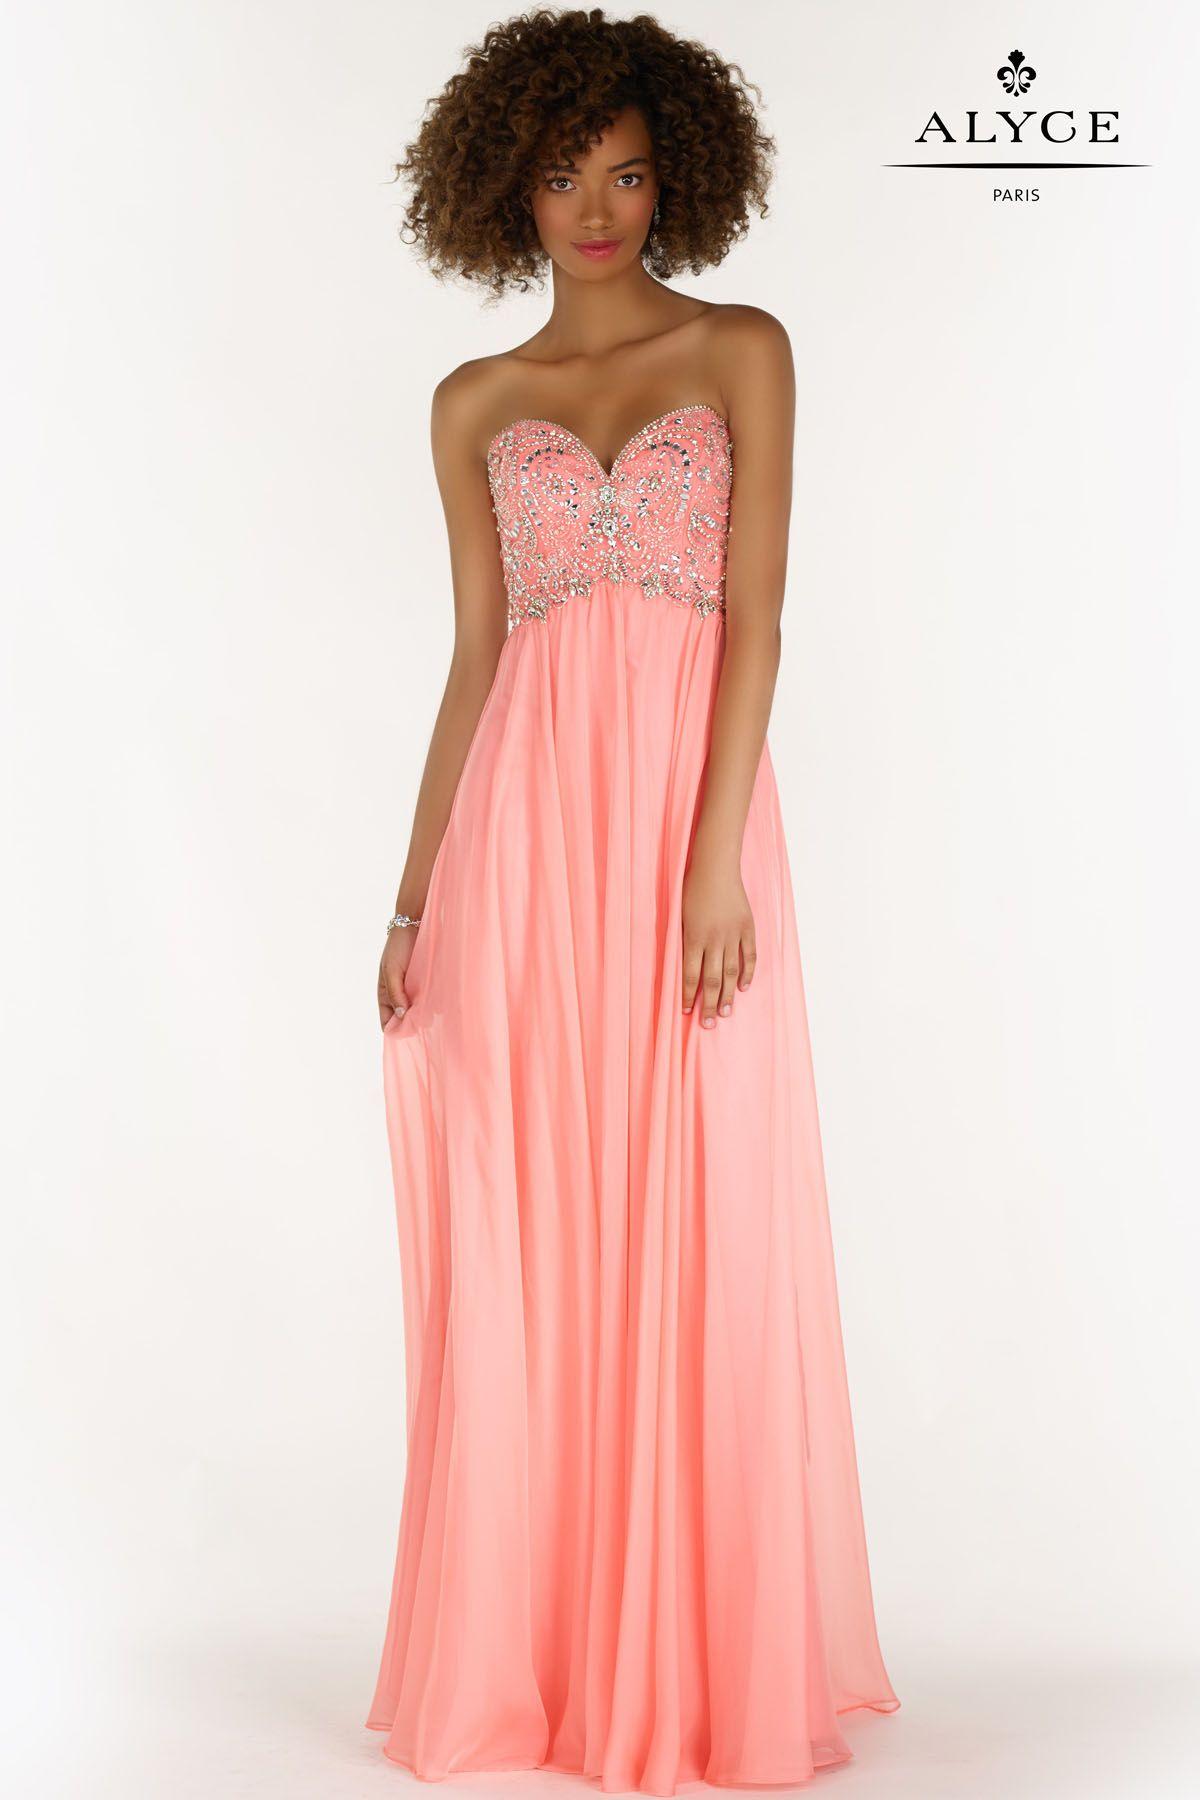 Alyce Paris 6682 pink prom dress #ipaporm | Alyce Paris Prom Dresses ...